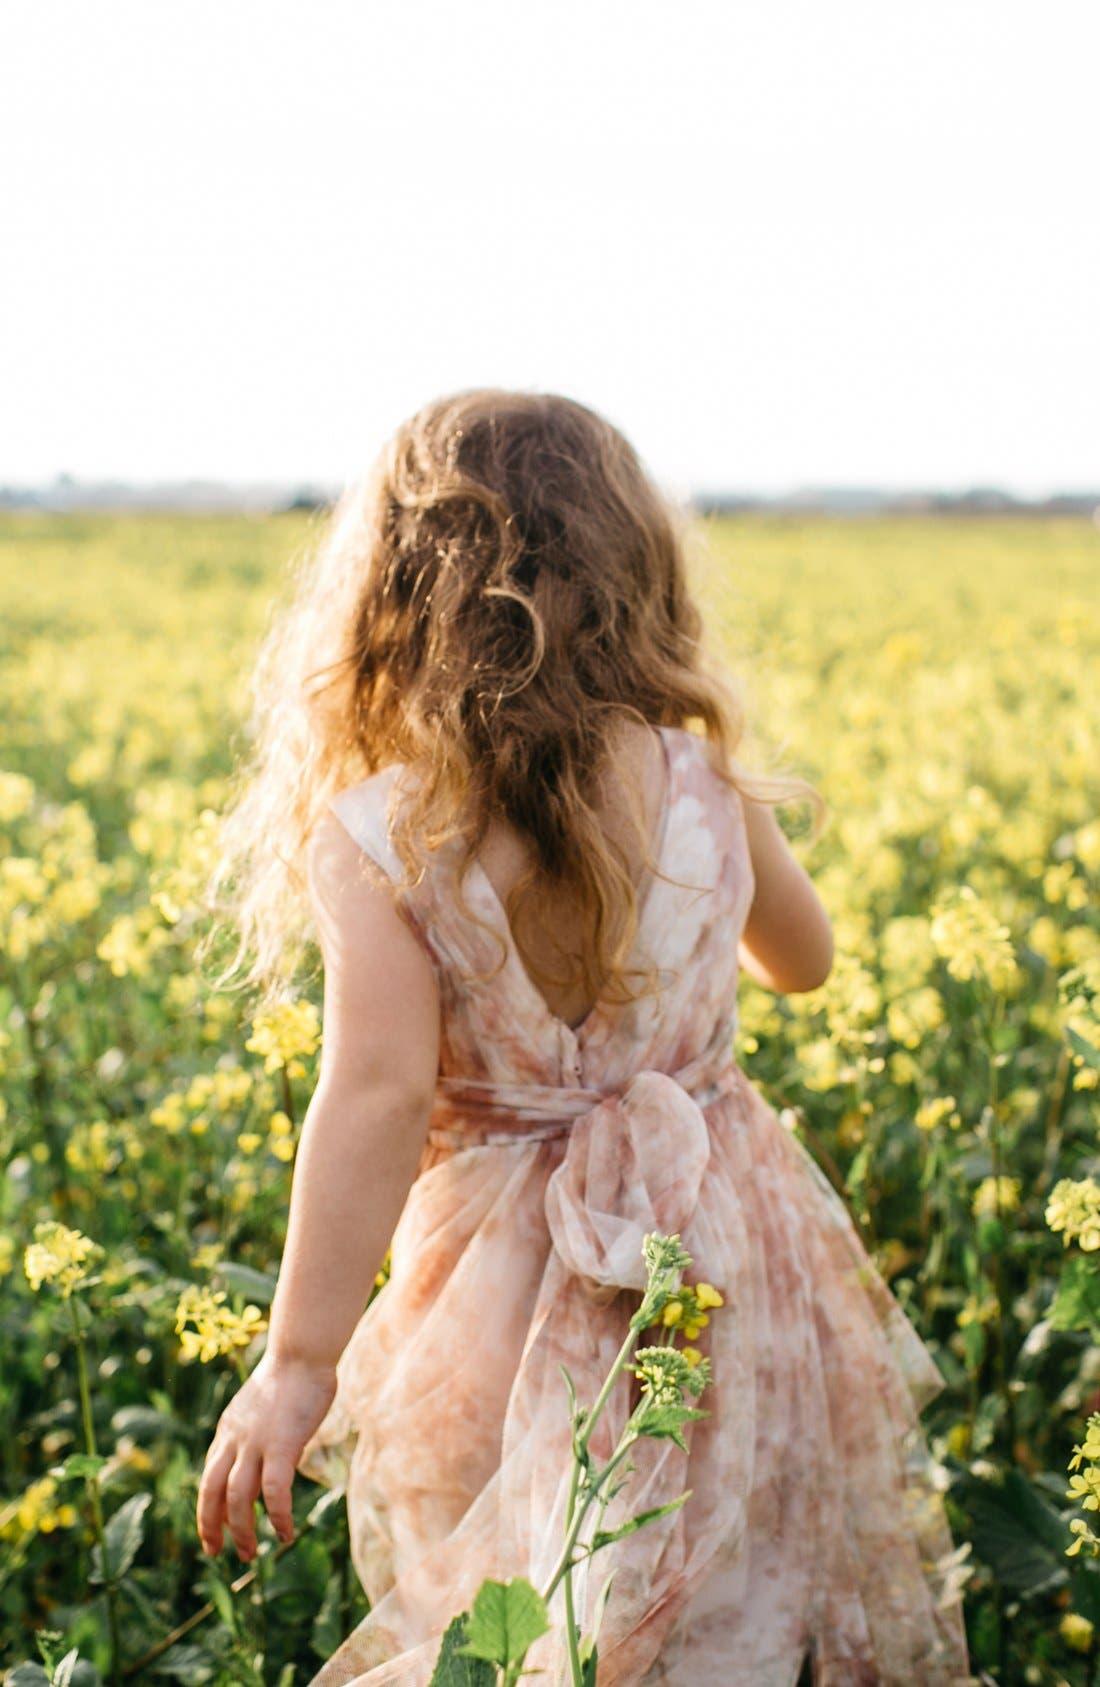 Etsy - Vintage Floral Tulle Dress,                             Alternate thumbnail 5, color,                             Blush Multi